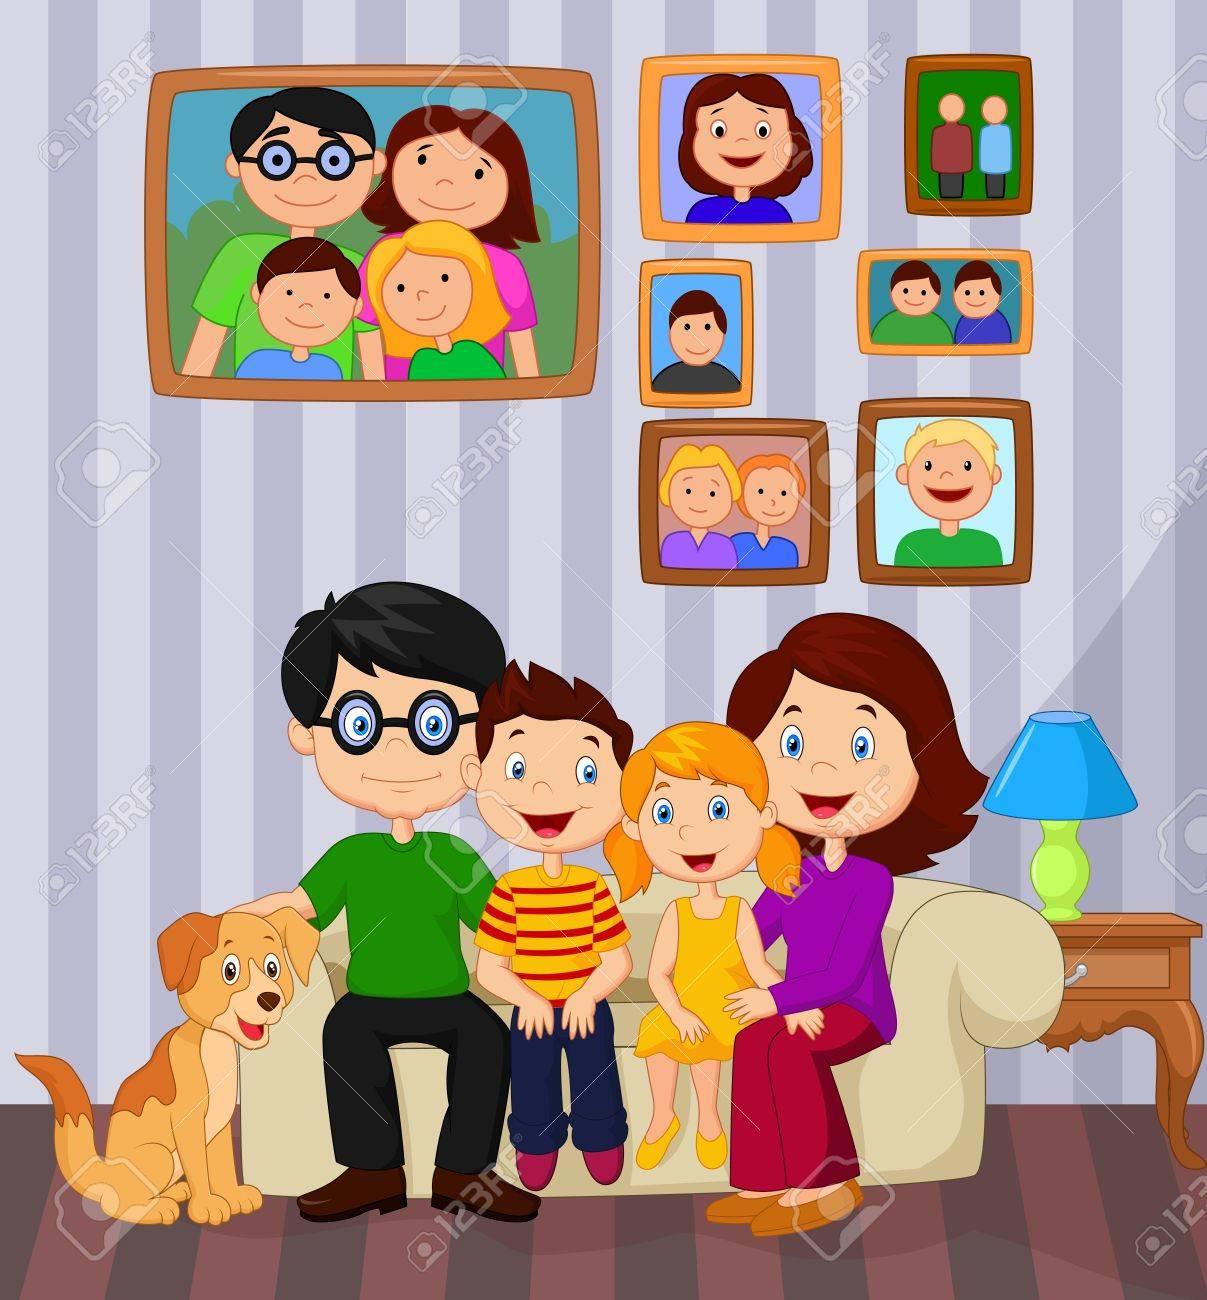 Dibujo Animado De La Familia Feliz Que Se Sienta En El Sofá